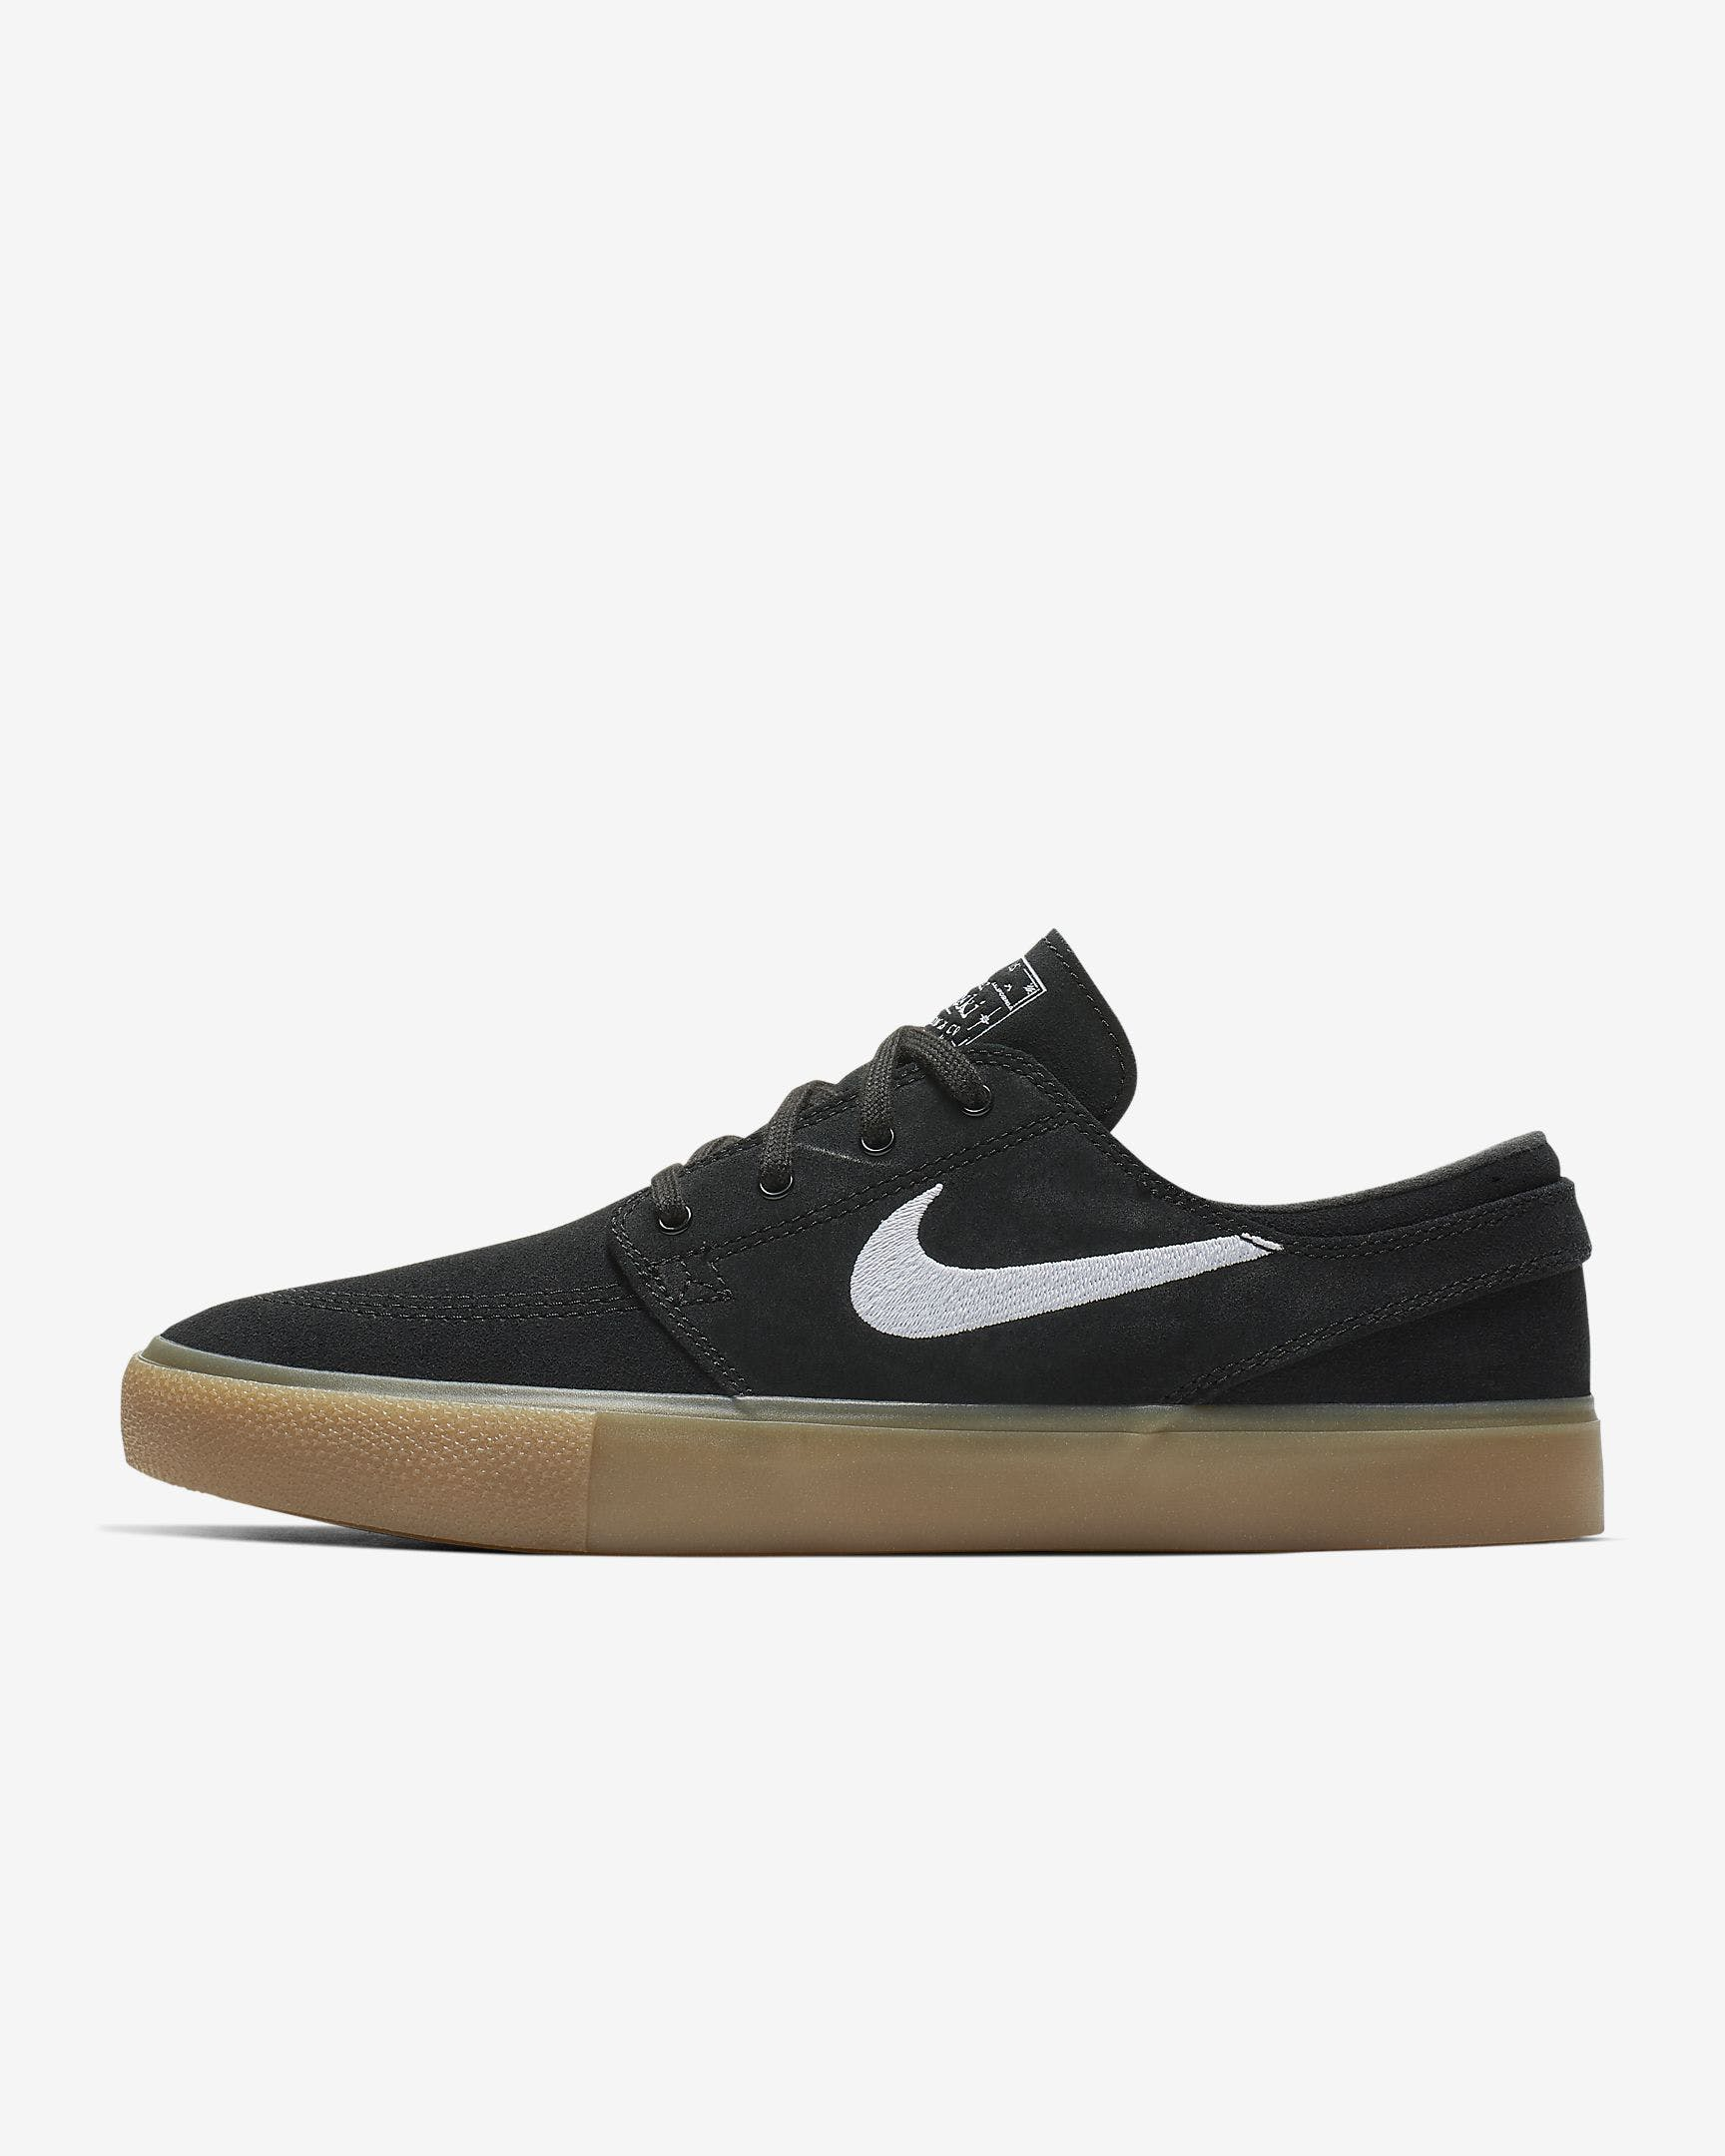 Nike SB Zoom Stefan Janoski RM Skater Shoe